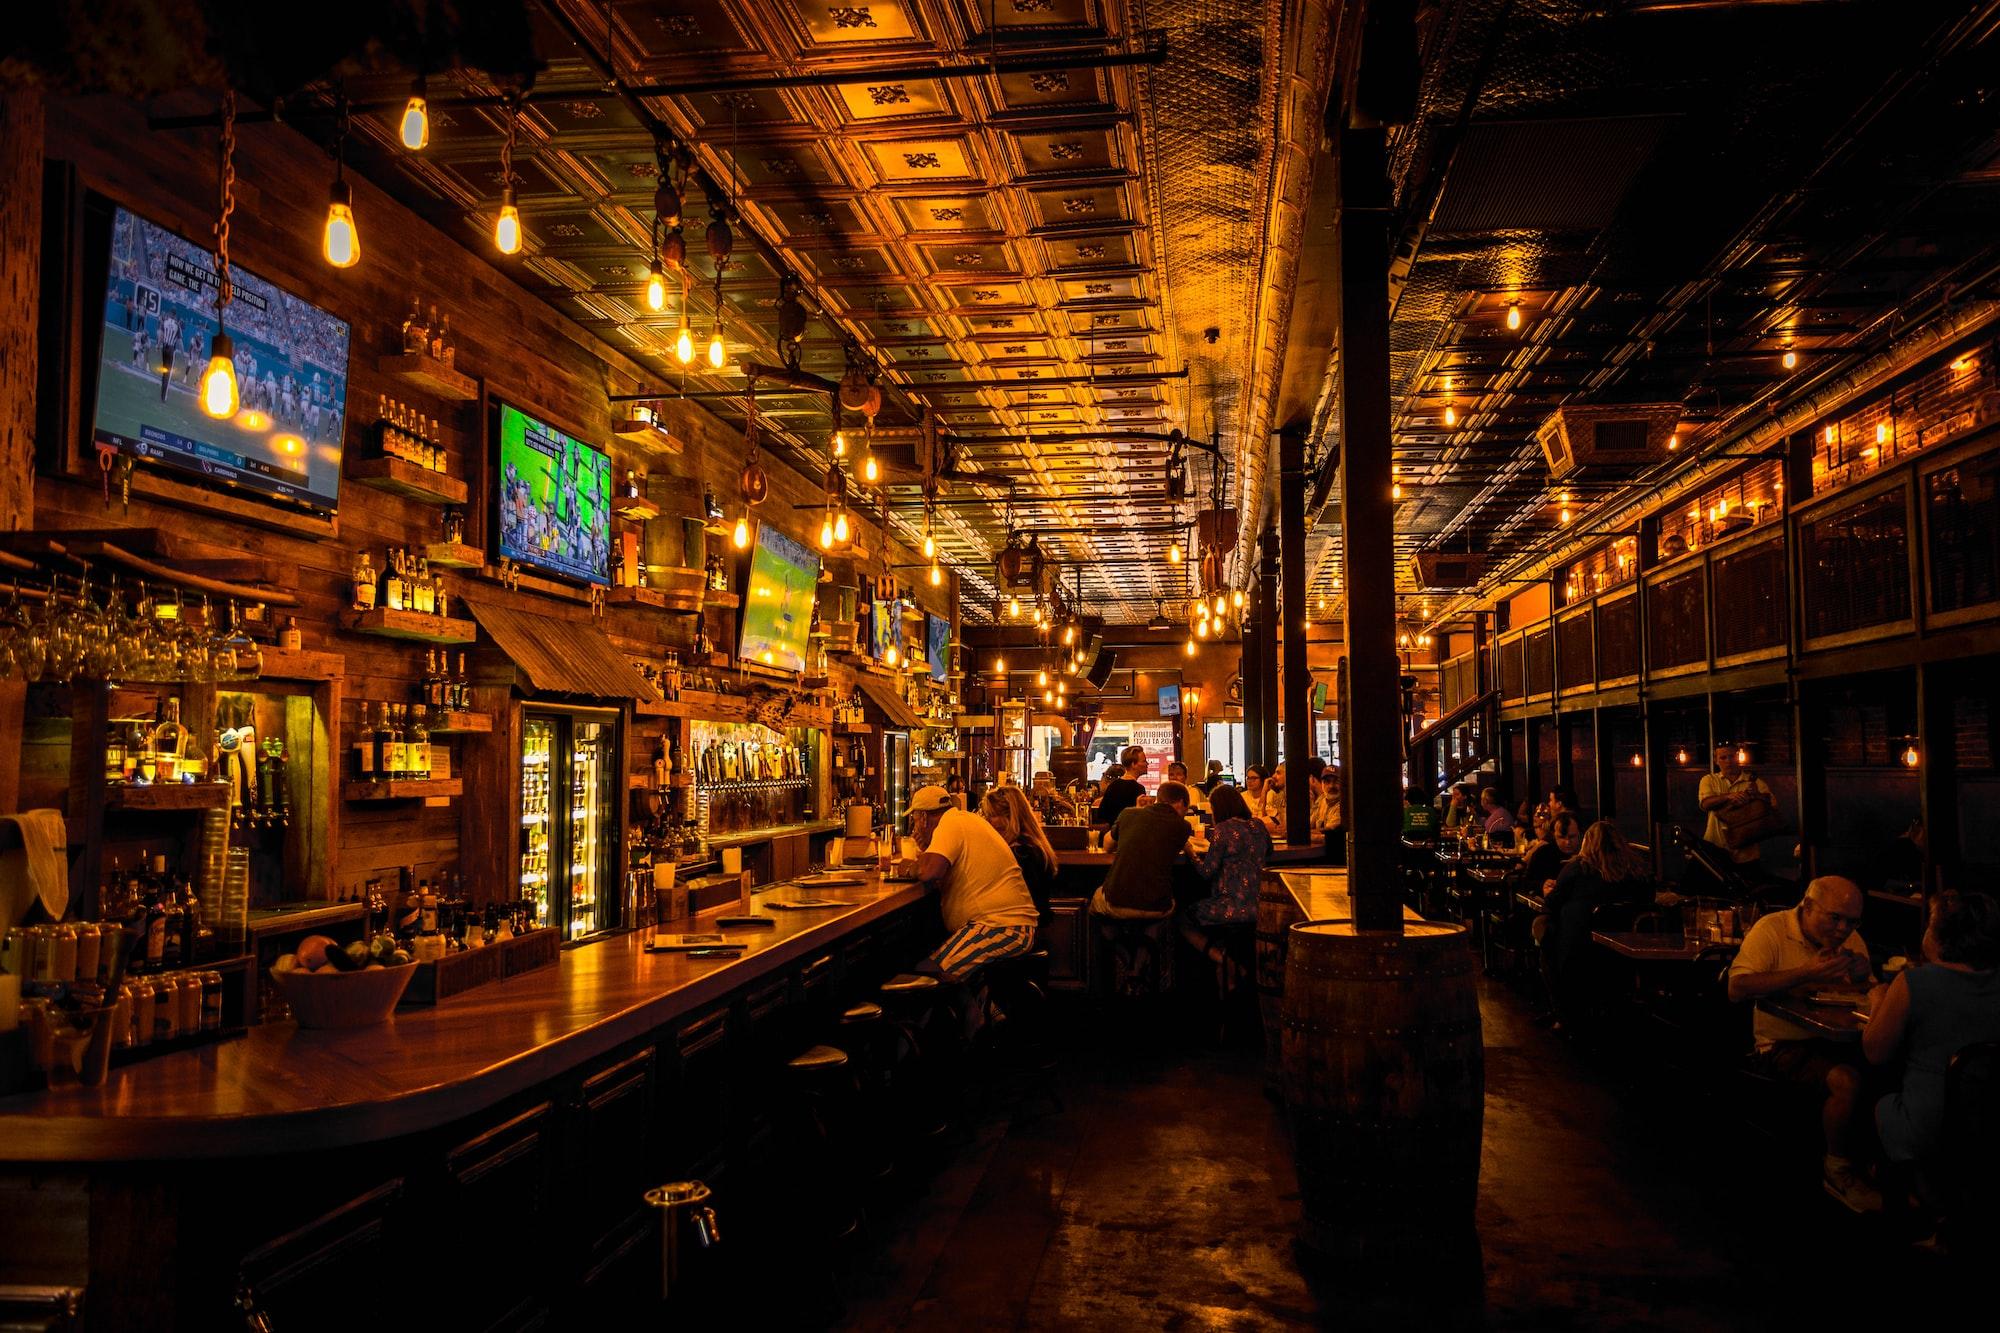 Taken inside prohibition kitchen in St. Augustine, FL on St. George St. A beautifully designed prohibition era restaurant.